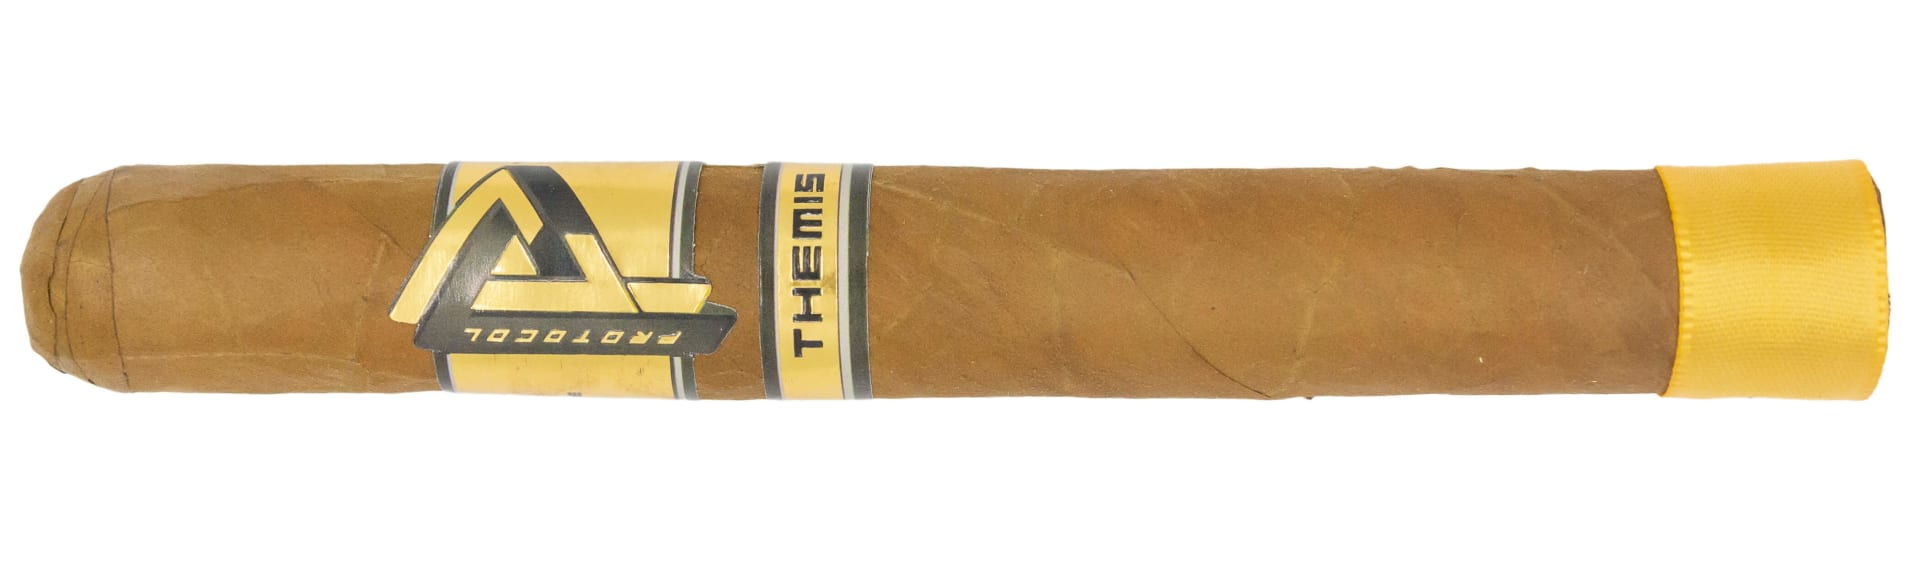 Blind Cigar Review: Cubariqueño | Protocol Themis Corona Gorda Featured Image